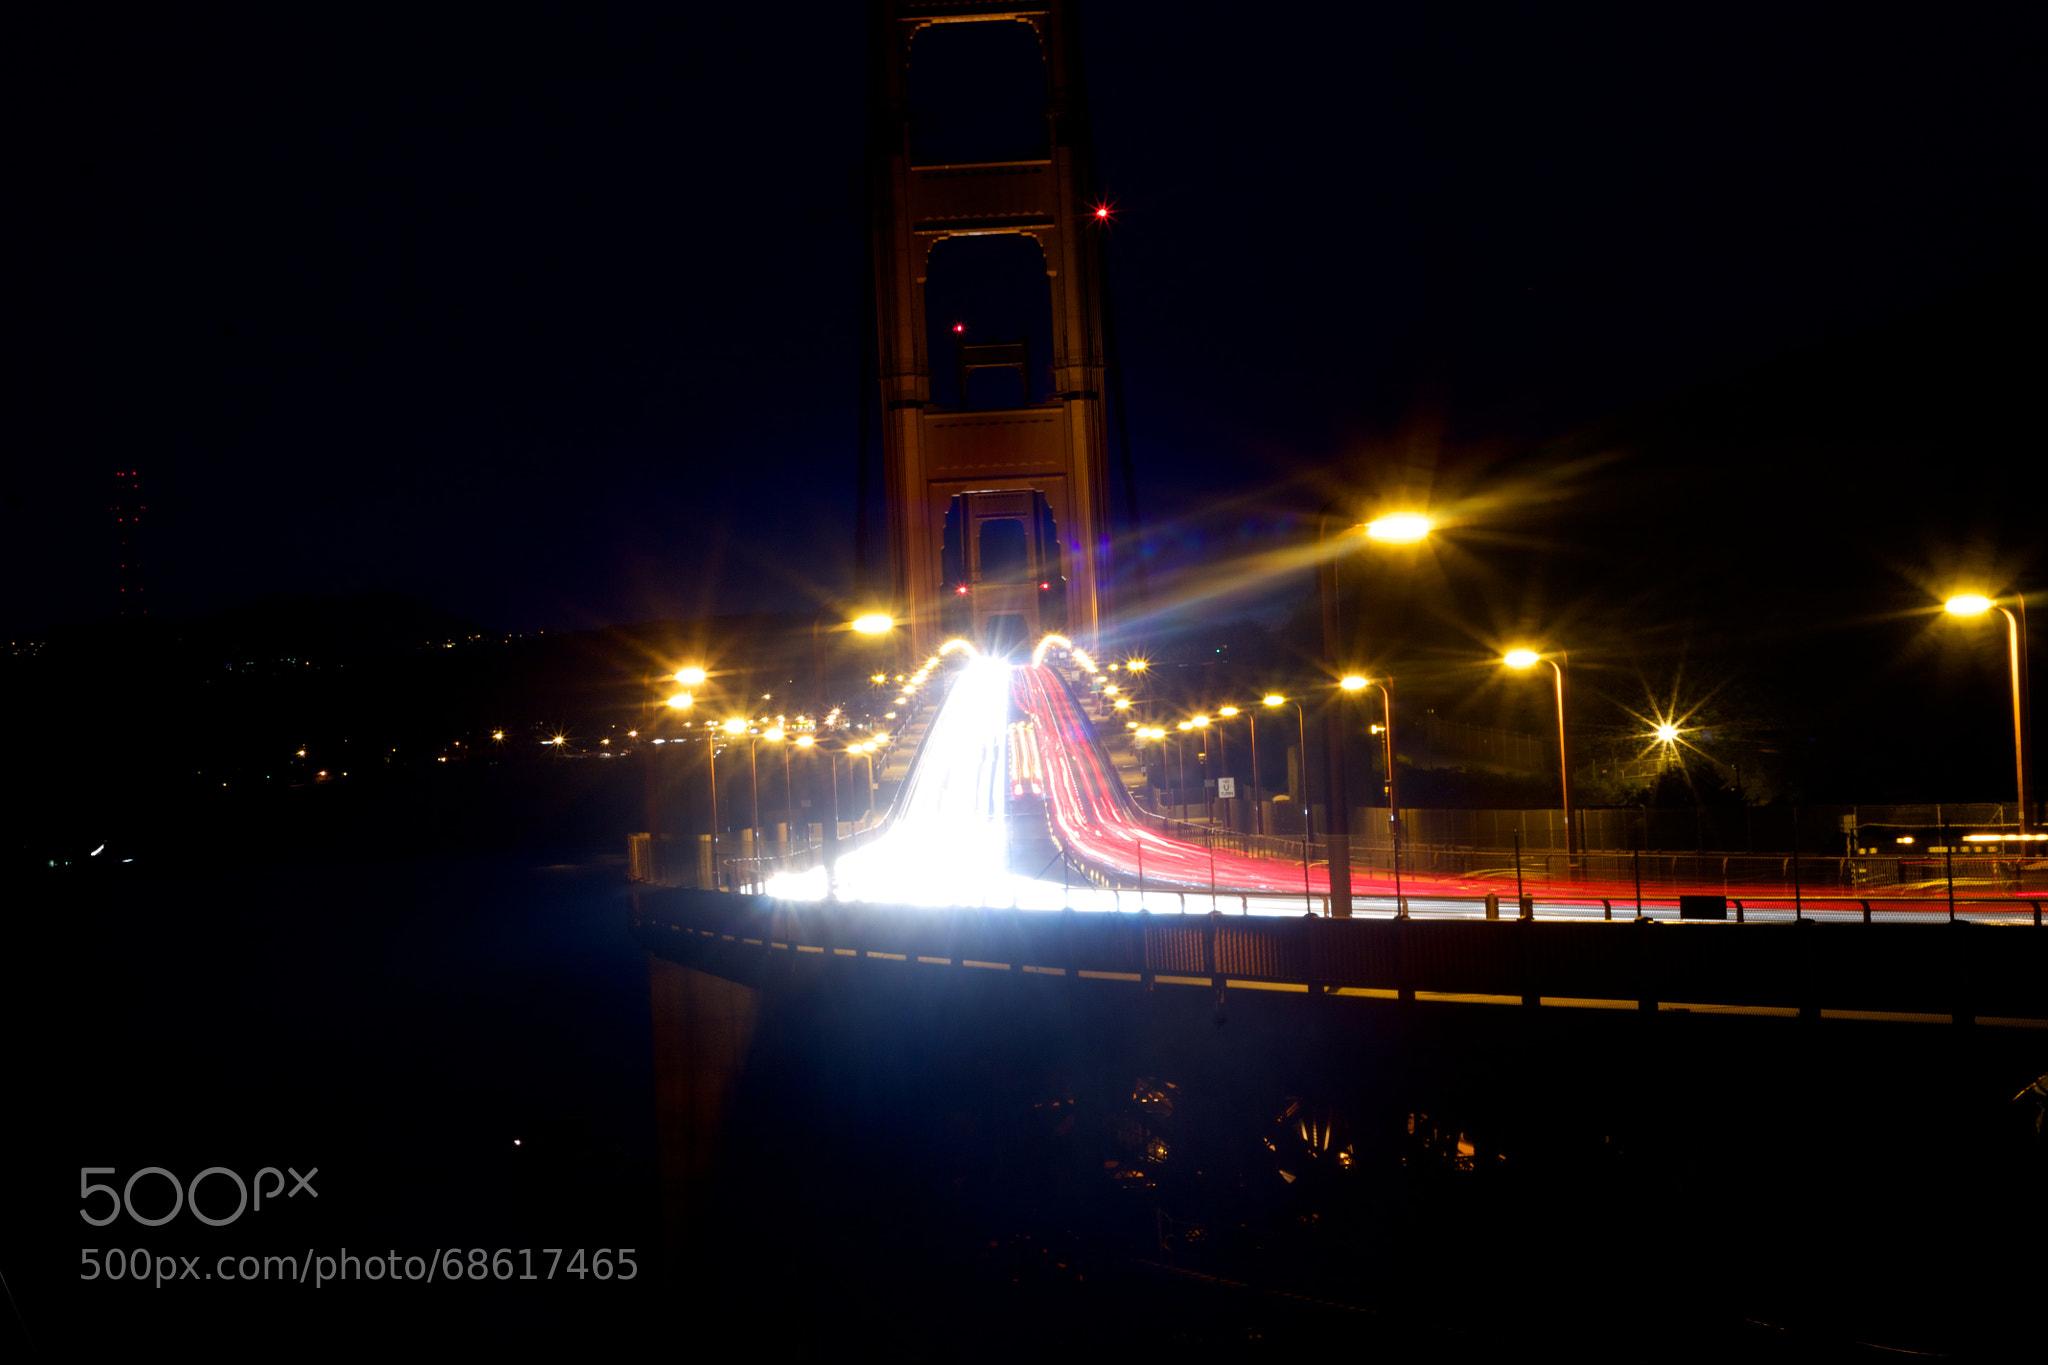 Photograph Traffic on the Golden Gate by Karthik Rangarajan on 500px